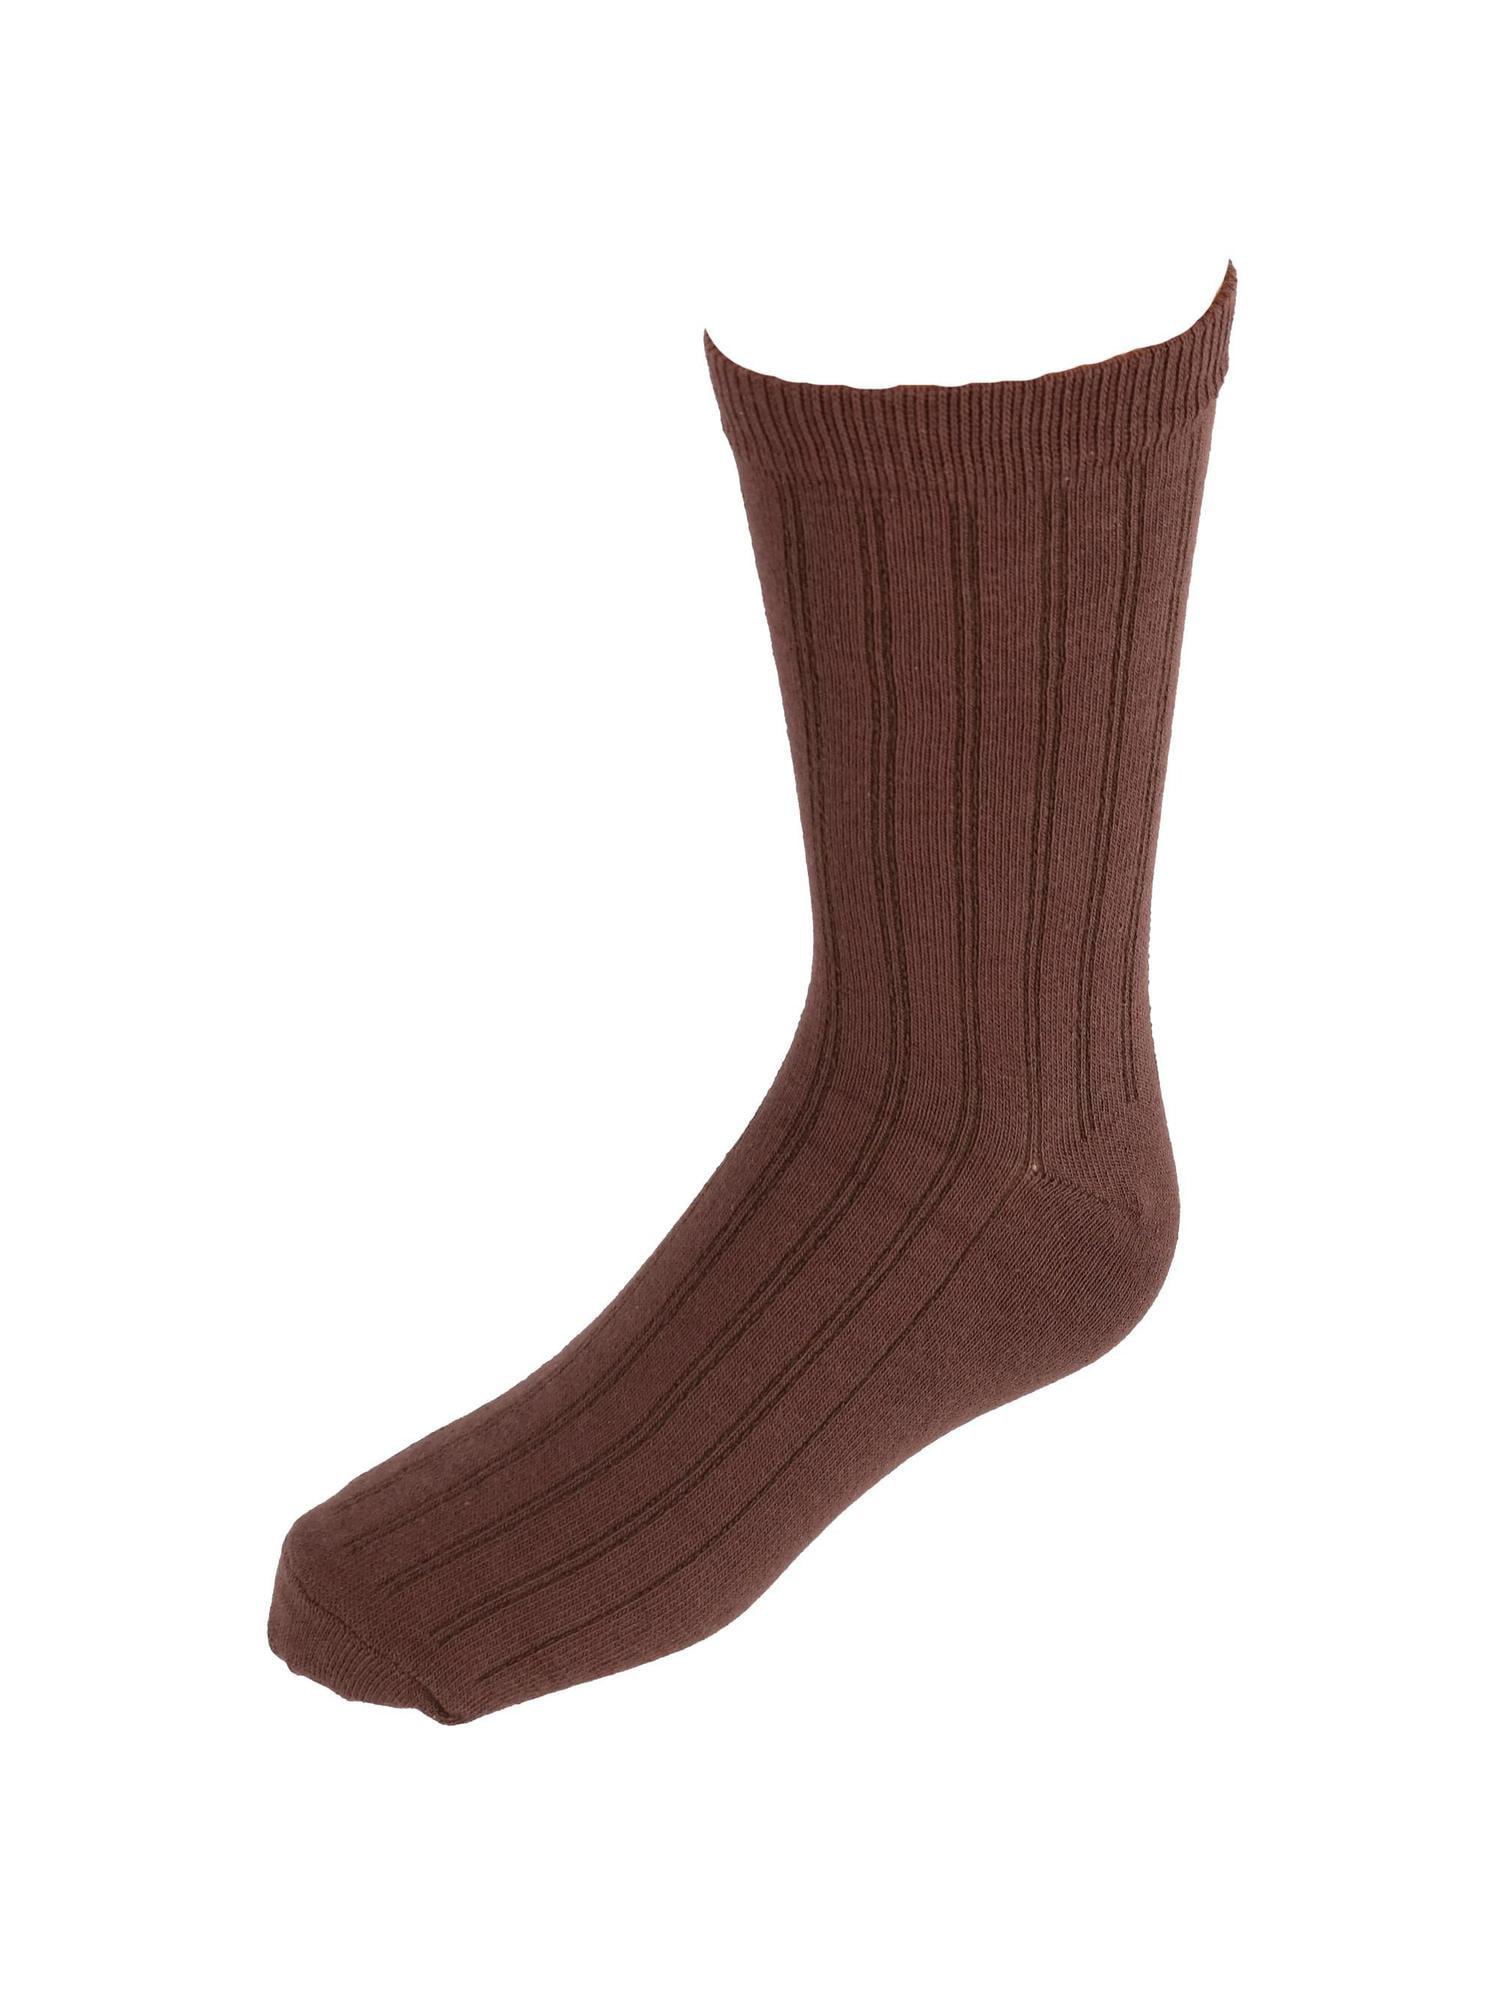 Kids' Cotton Ribbed Uniform Crew Socks